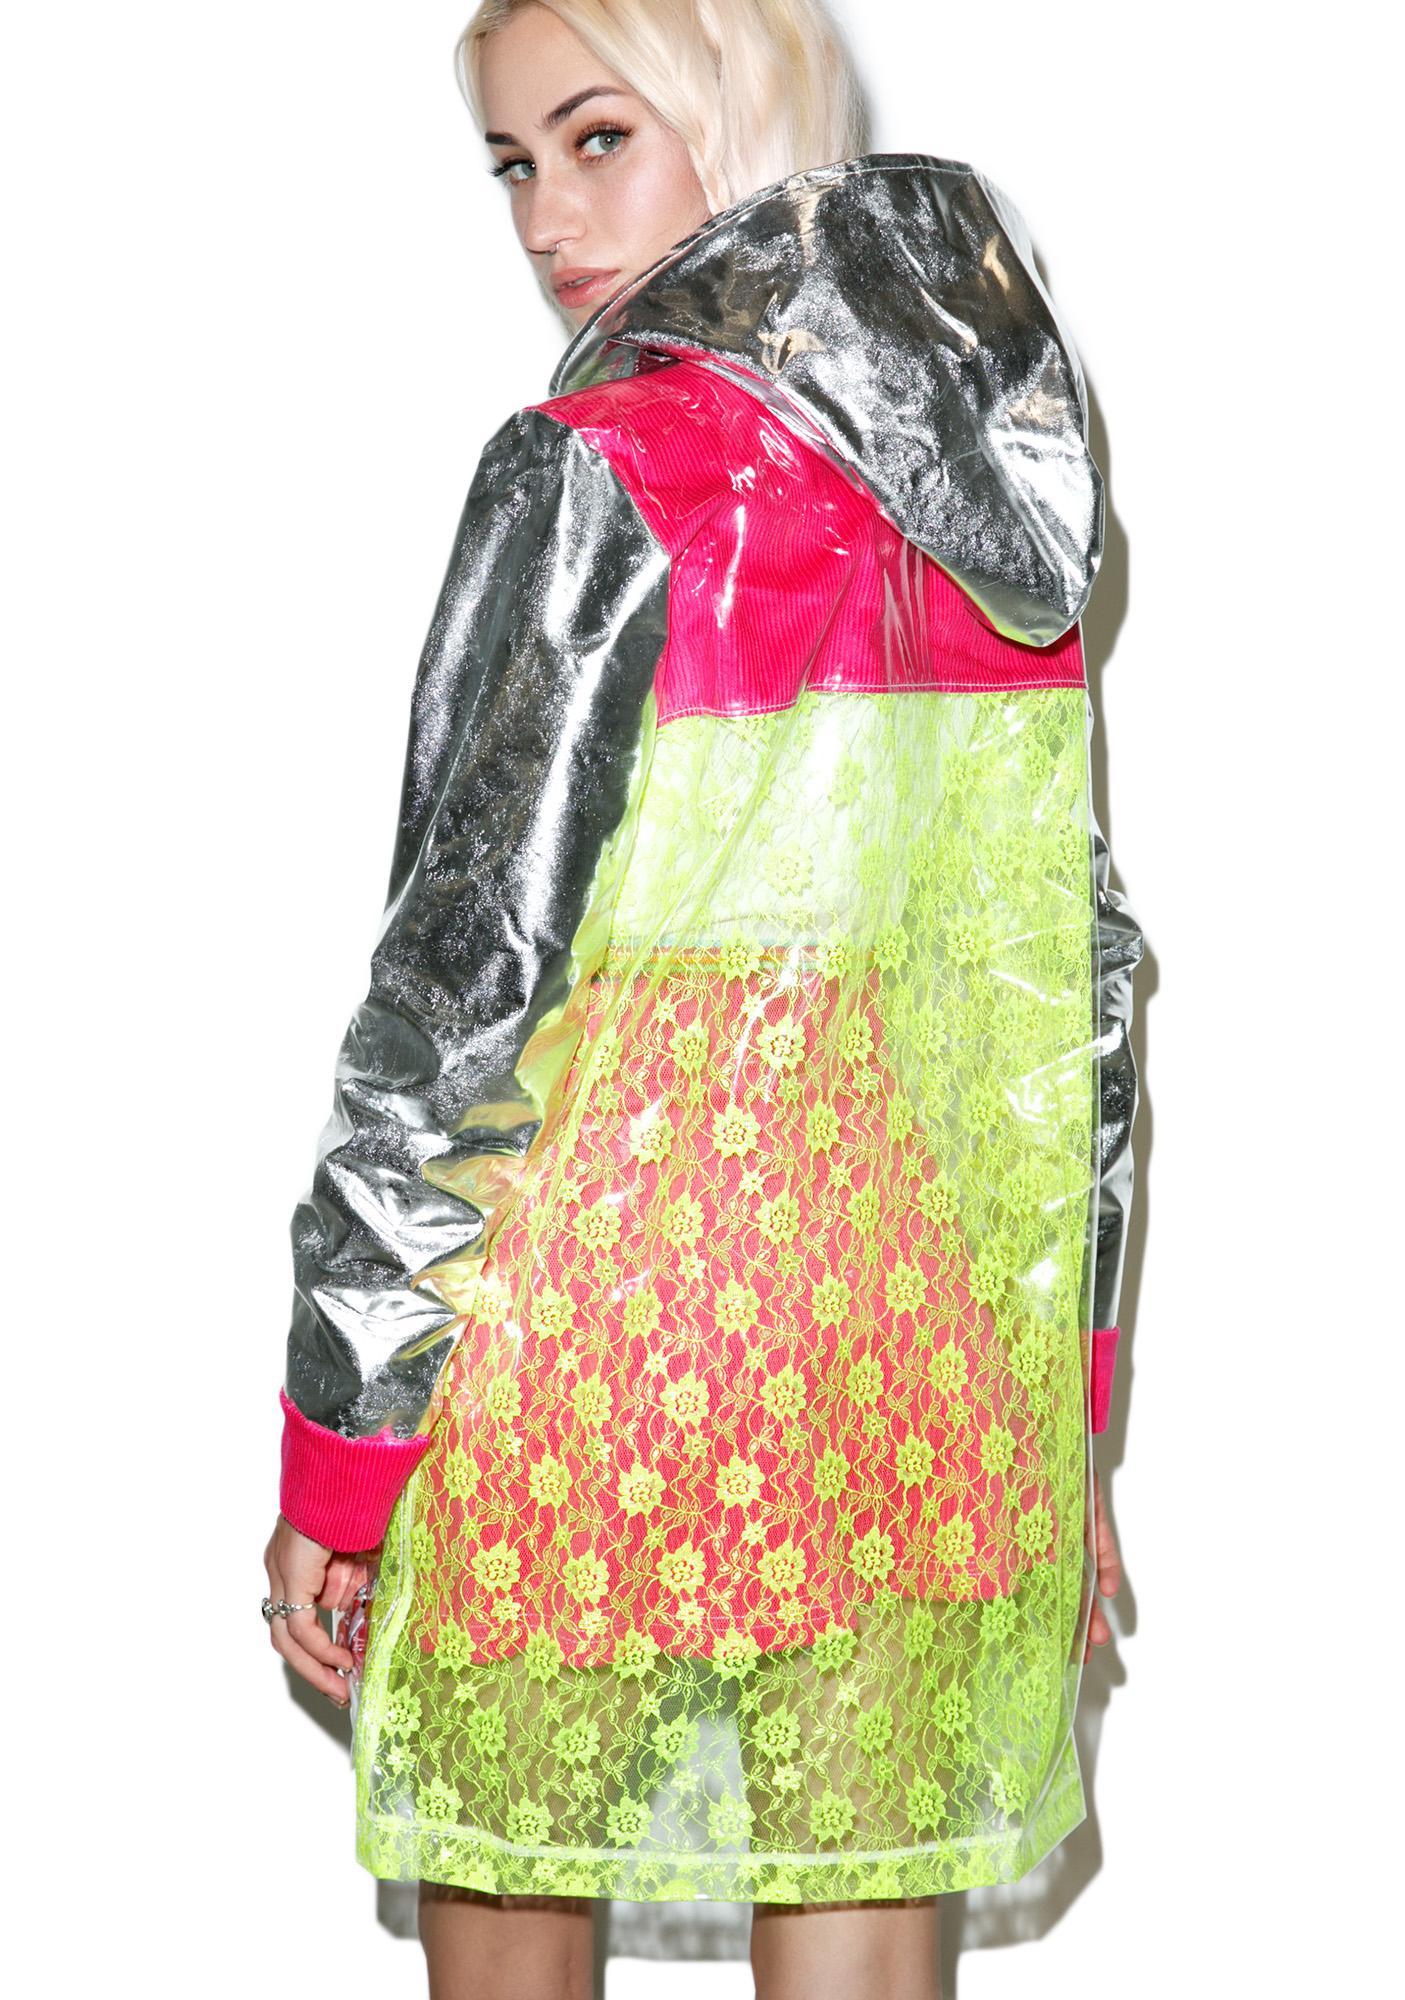 The Ragged Priest Species Jacket